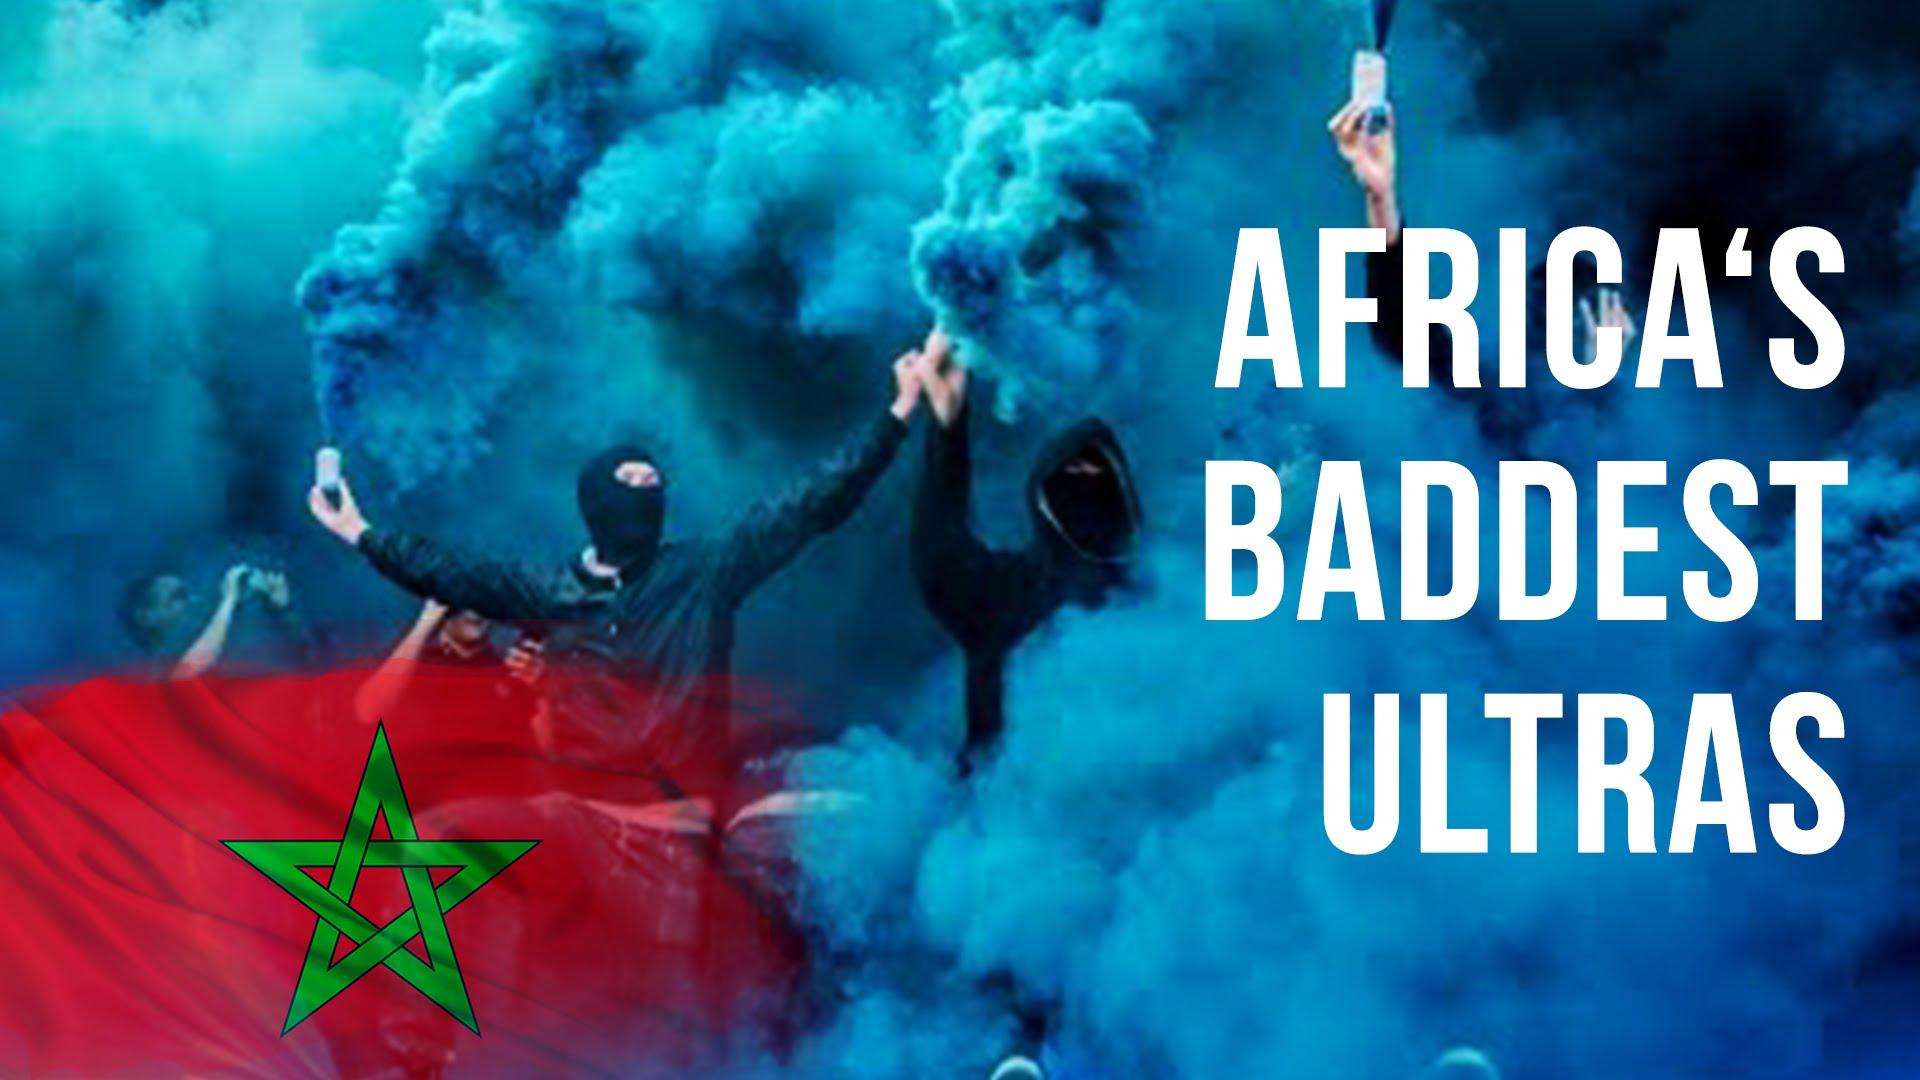 africas-baddest-ultras-morocco